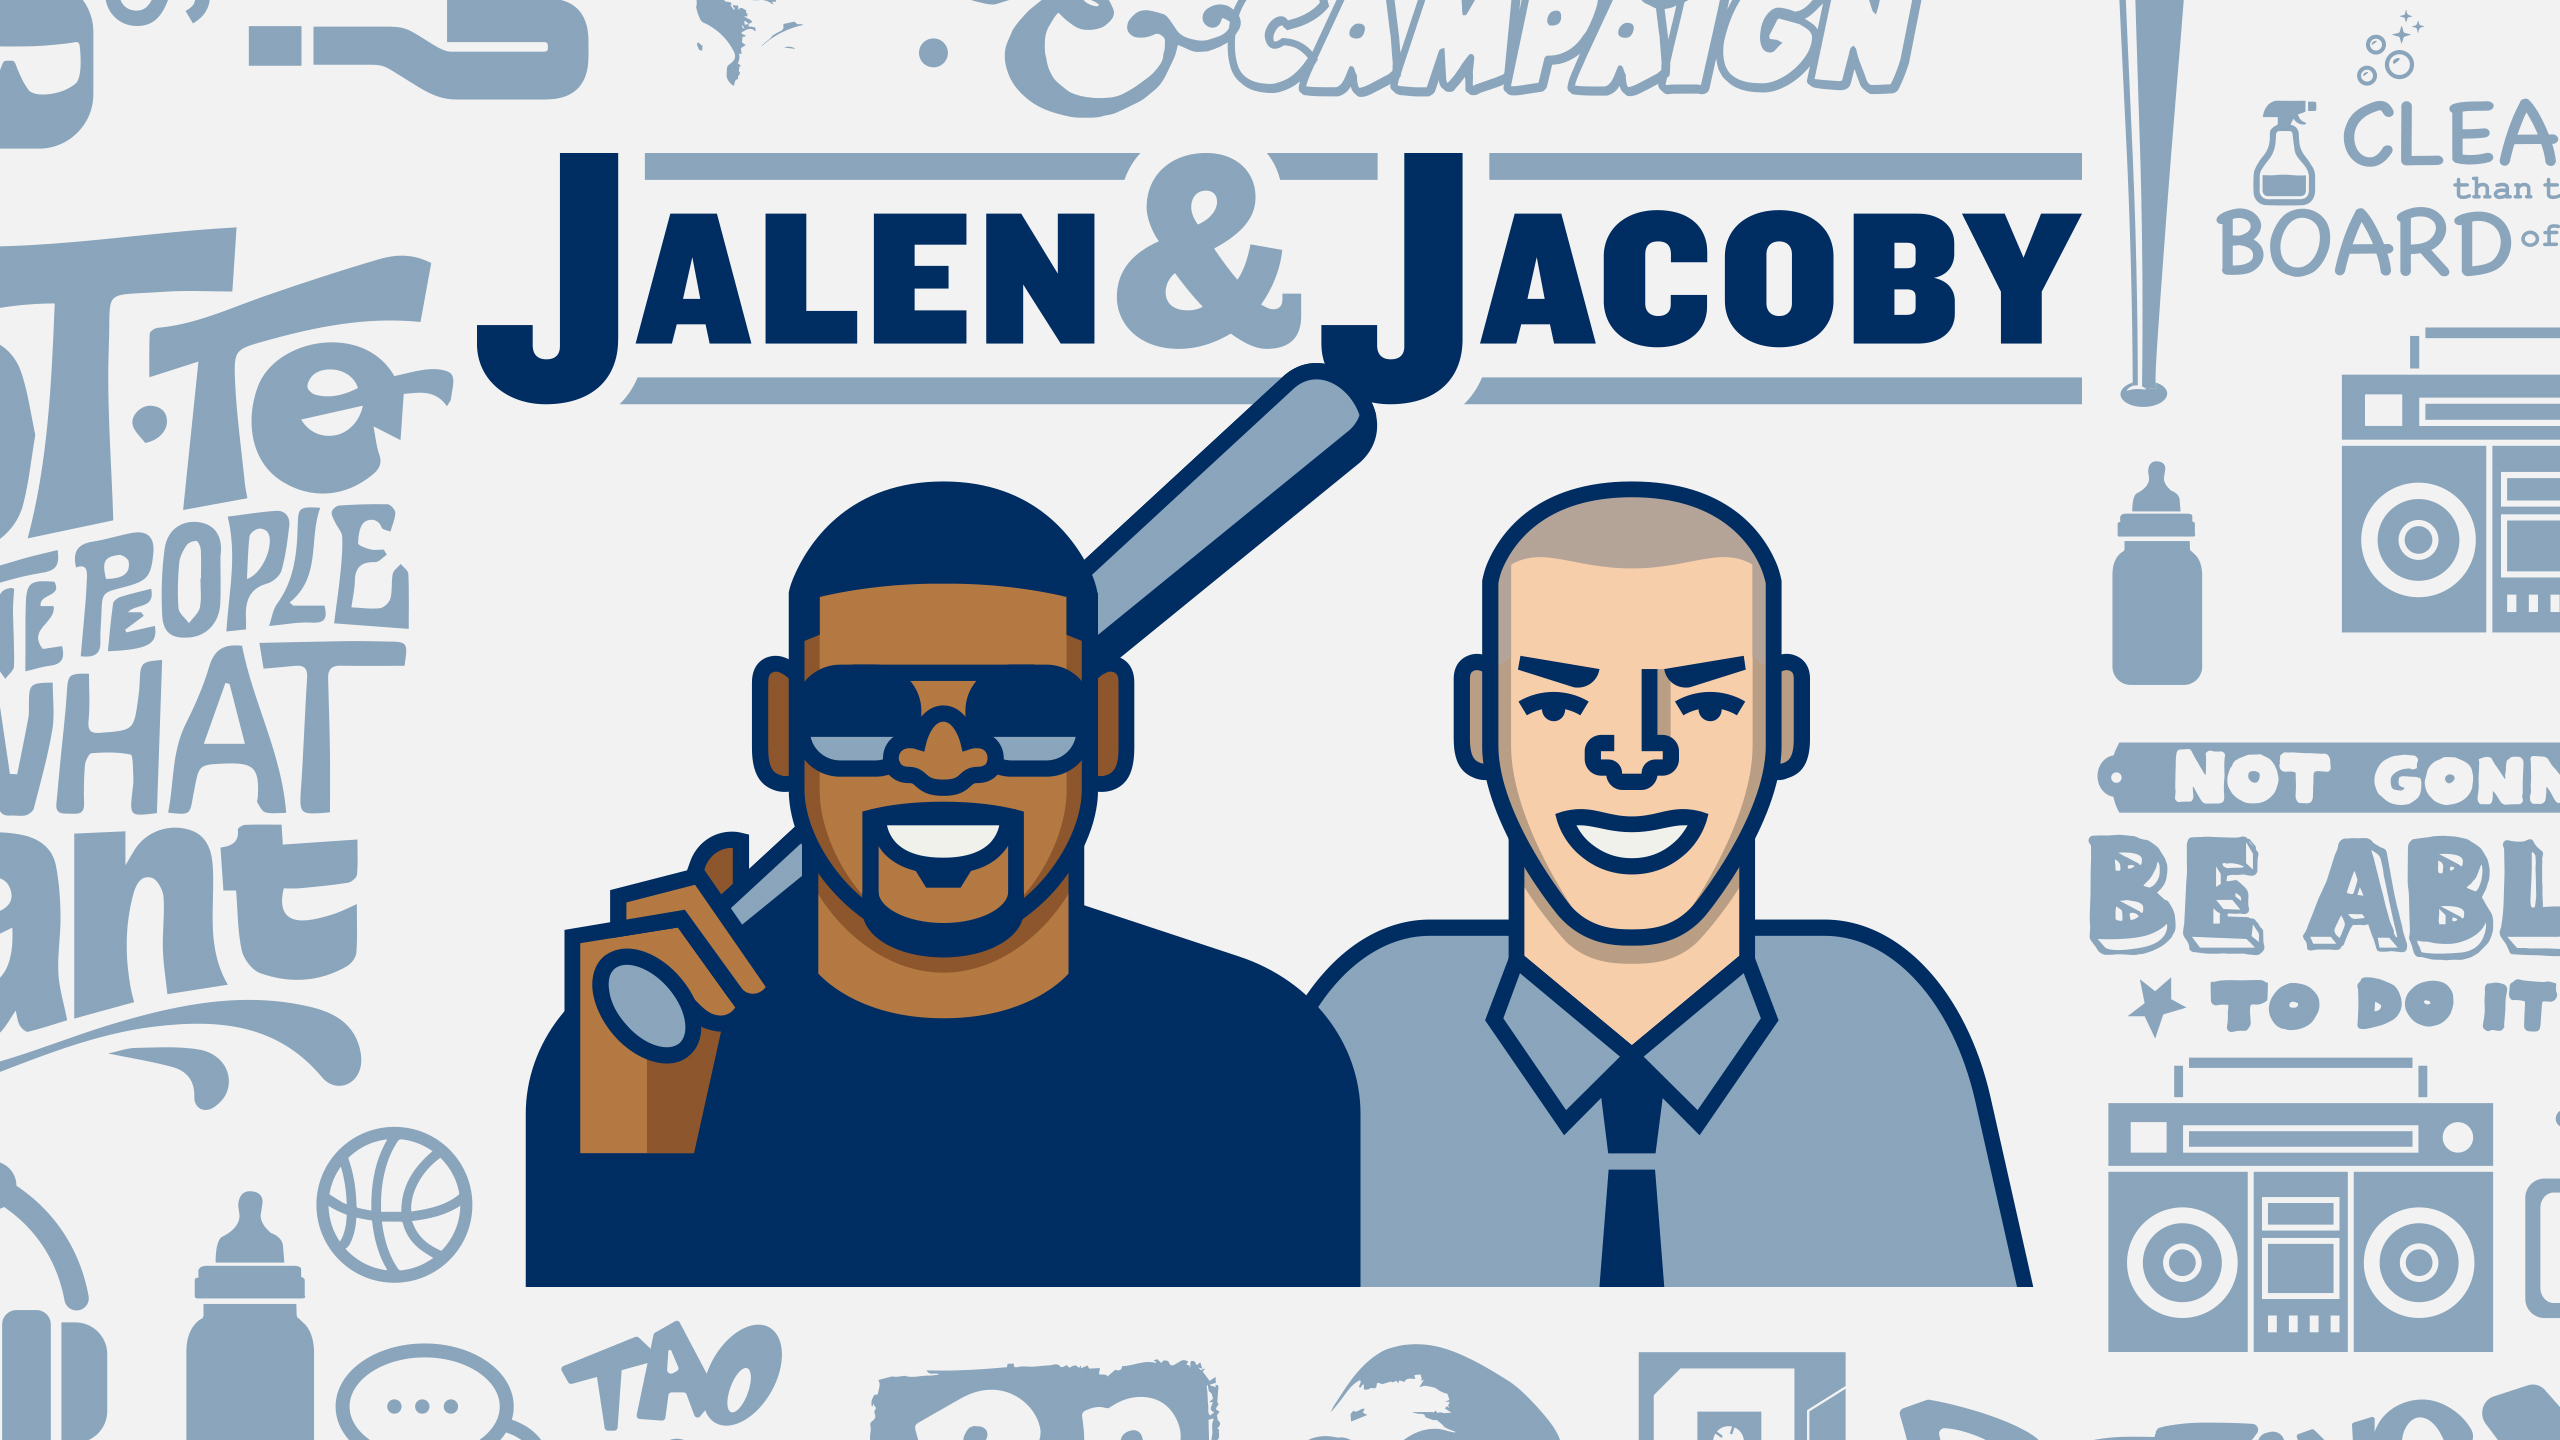 Mon, 10/15 - Jalen & Jacoby